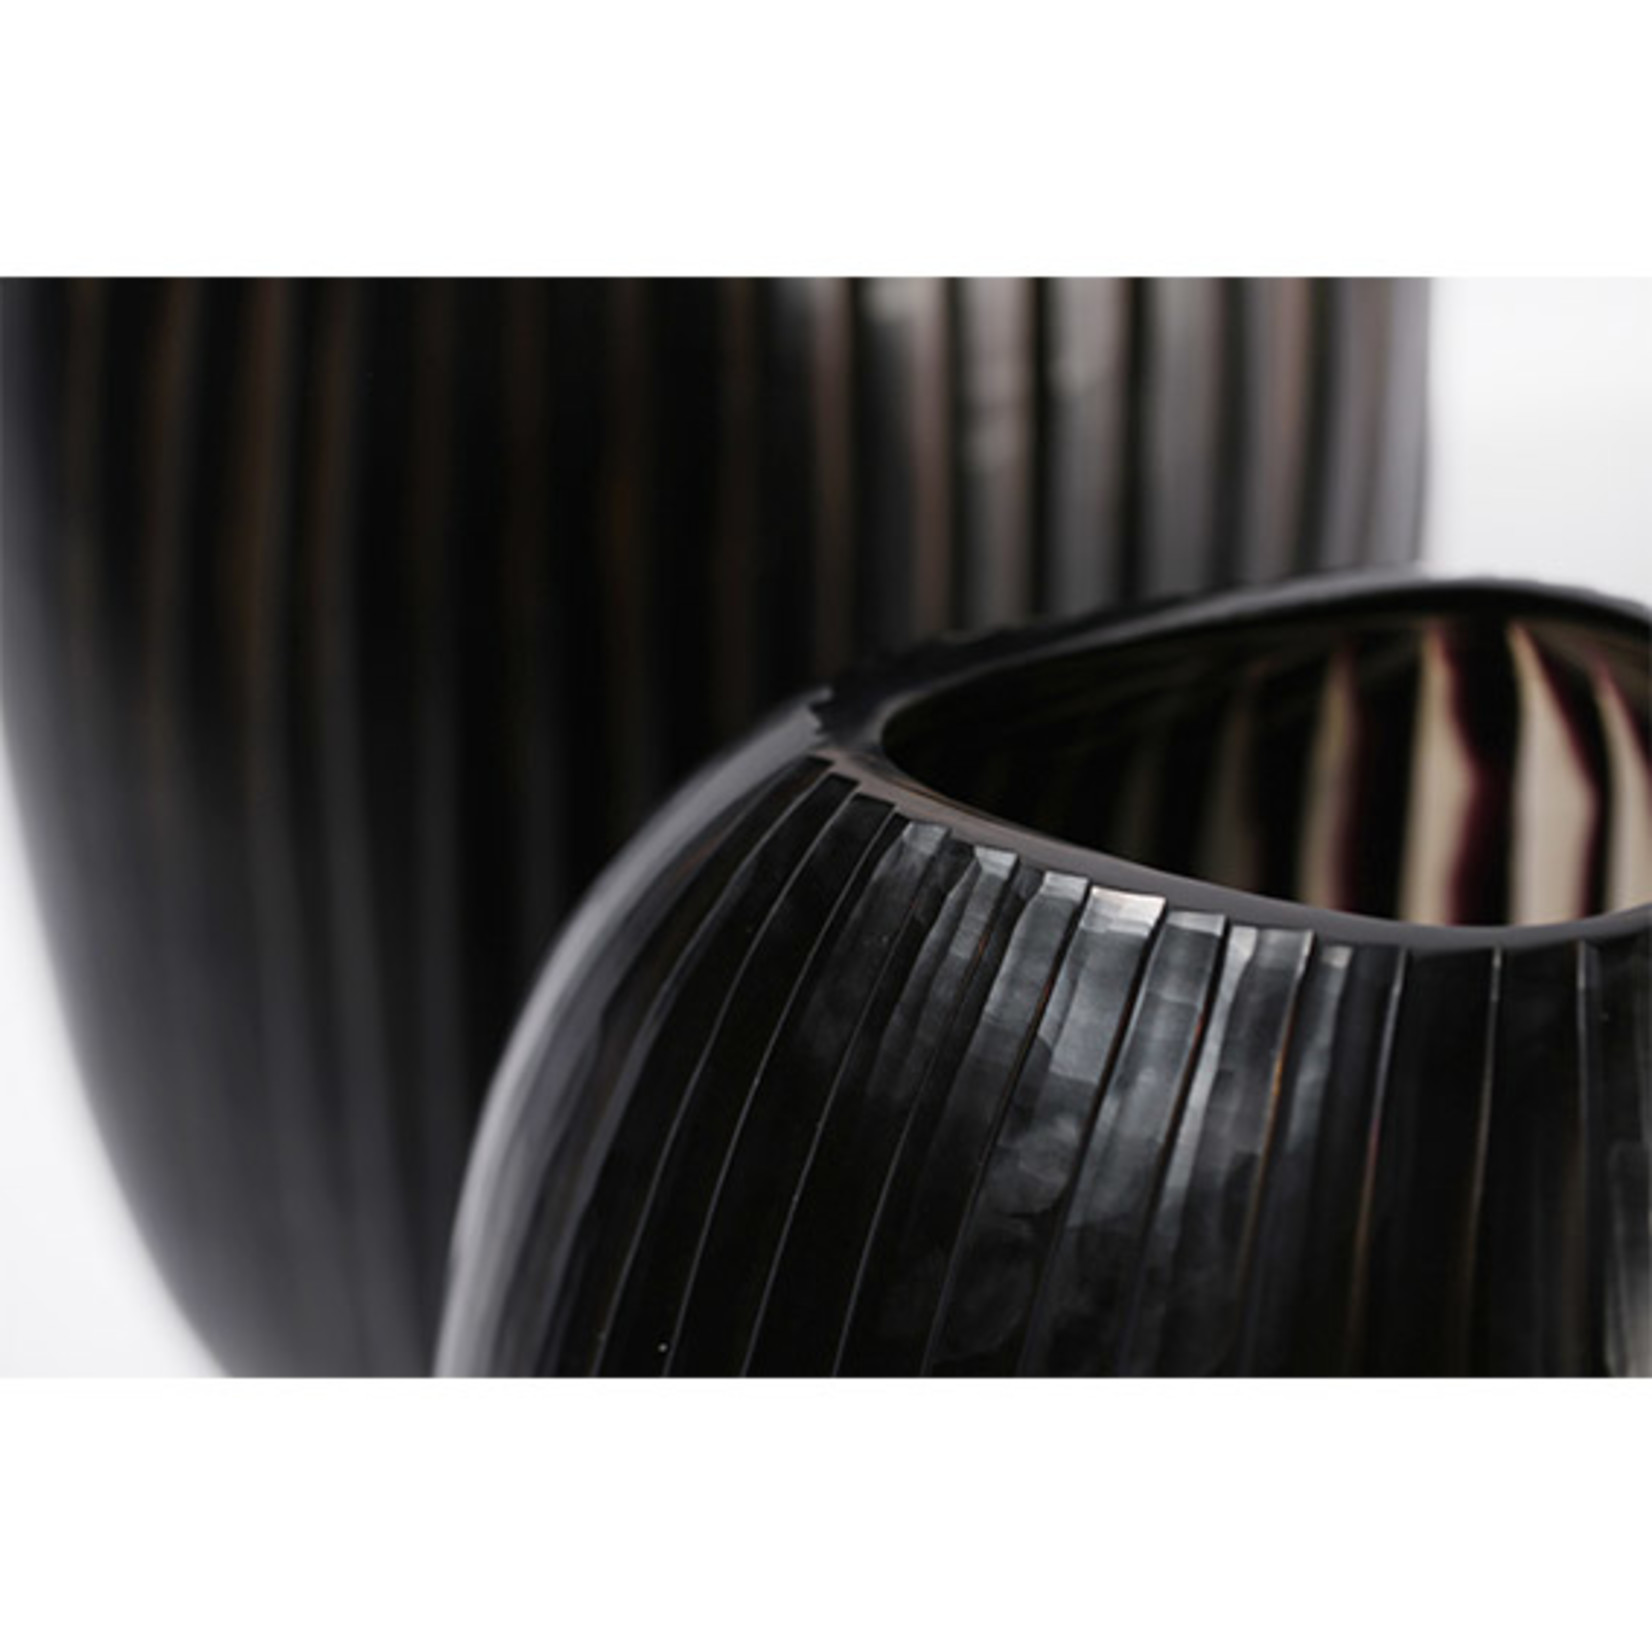 Guaxs Vase Patara Round | Smoke Gray / Black